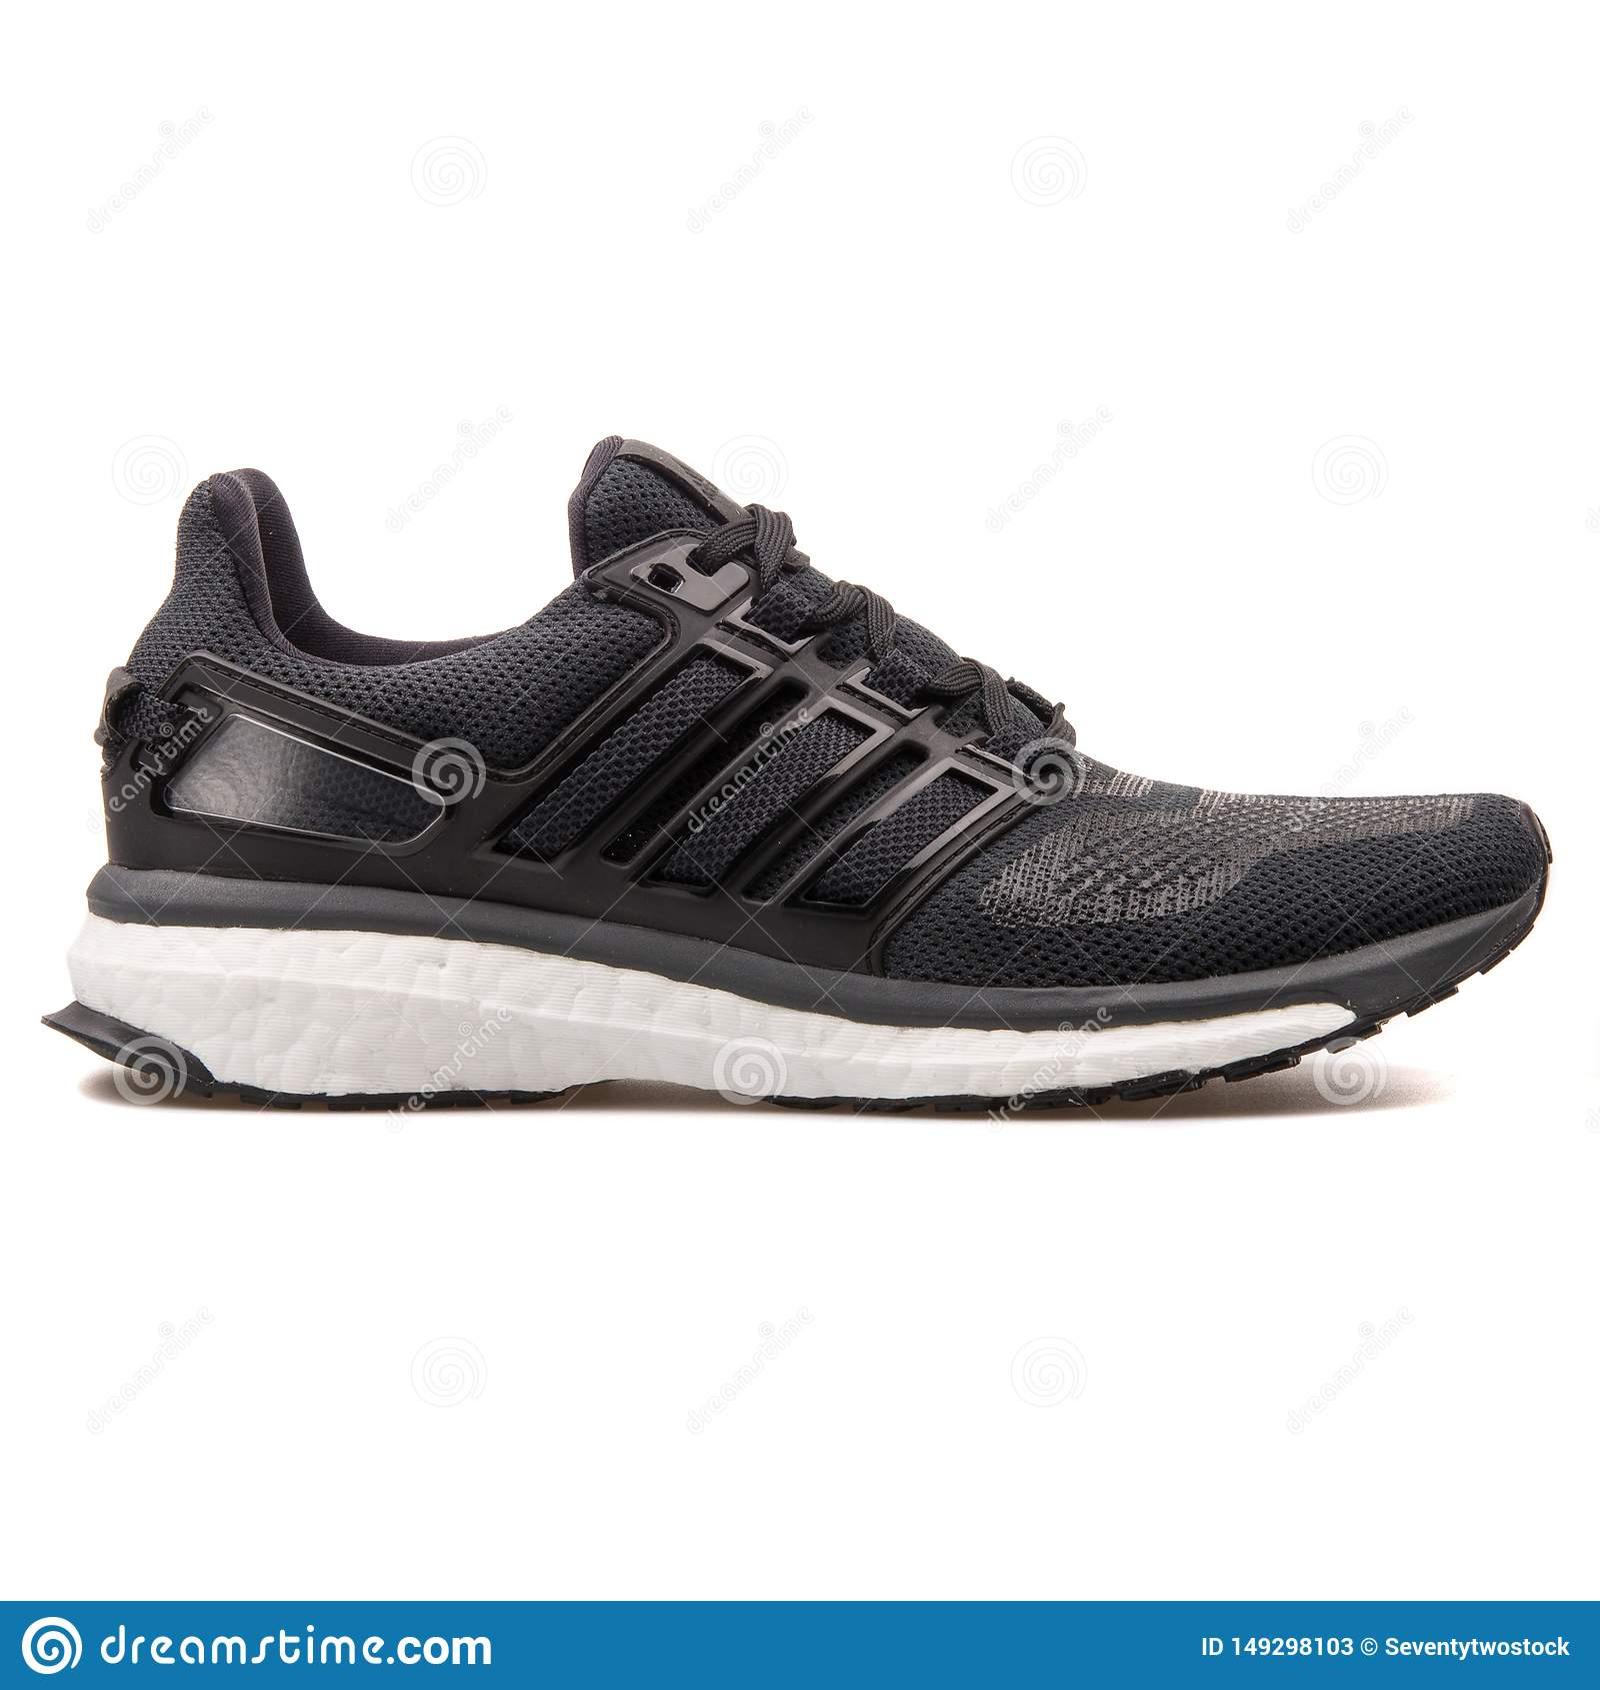 Adidas Energy Boost 3 Black Sneaker Editorial Stock Photo - Image ...